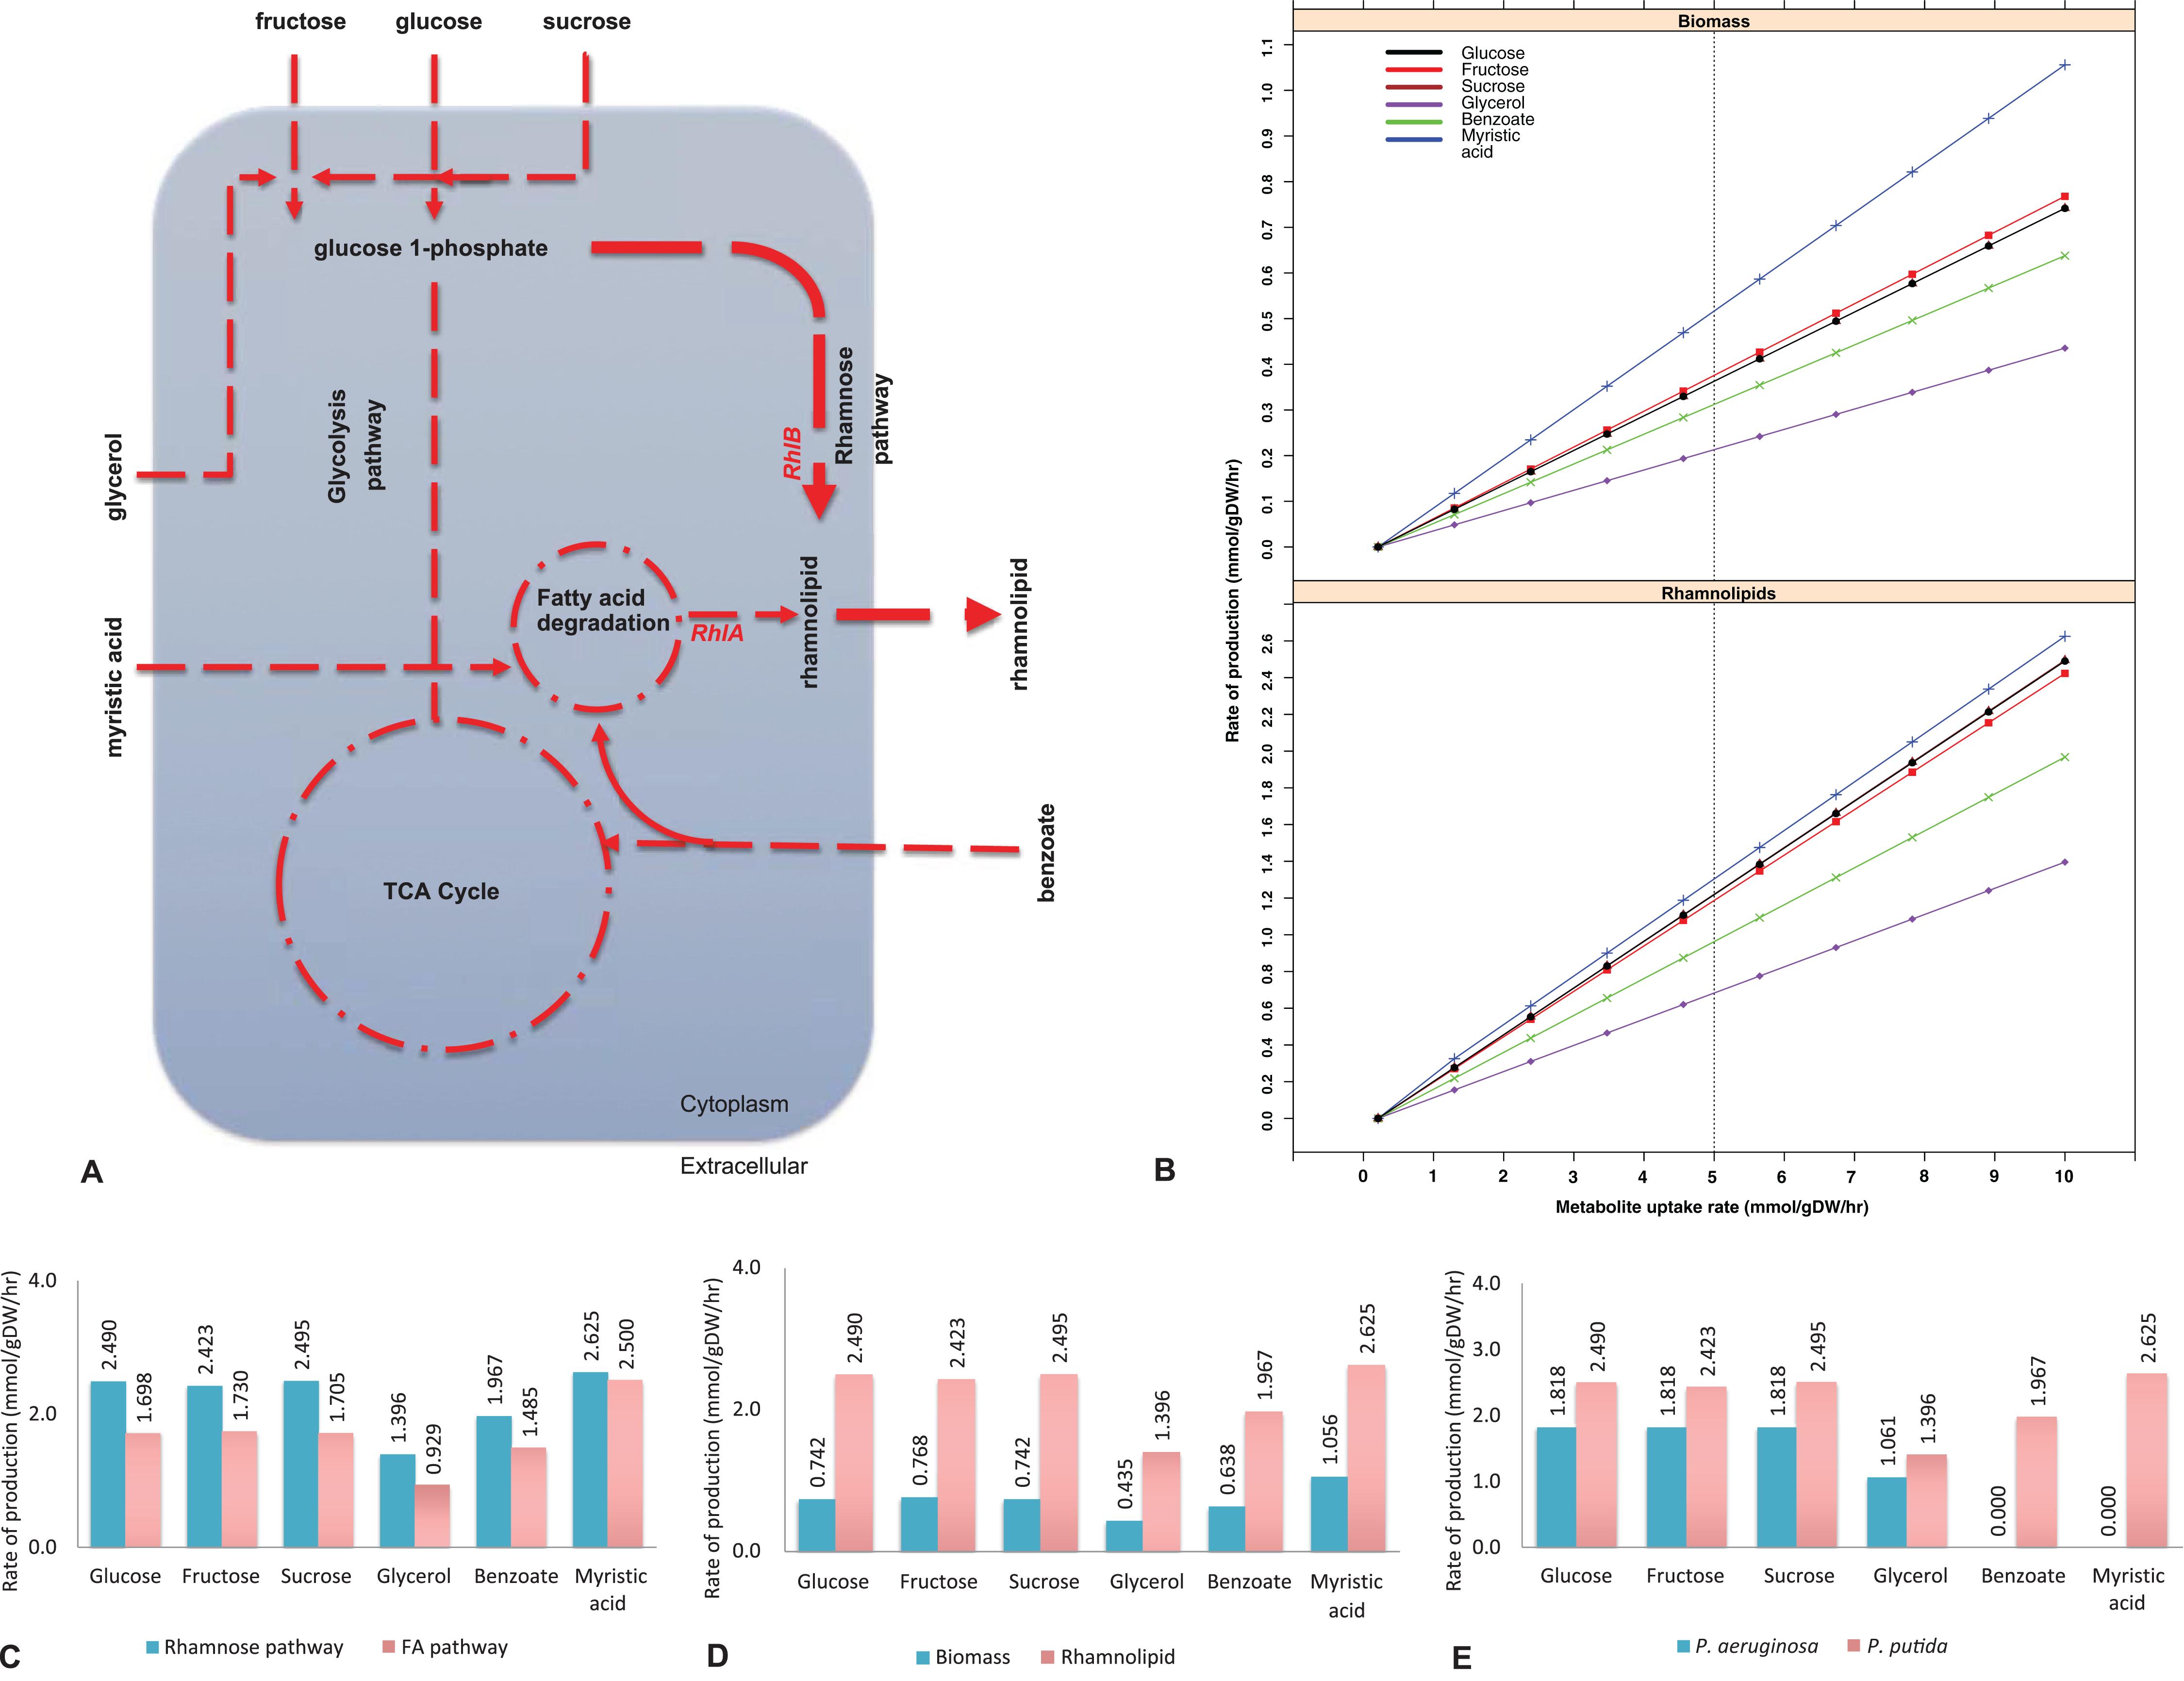 In silico engineering of Pseudomonas metabolism reveals new